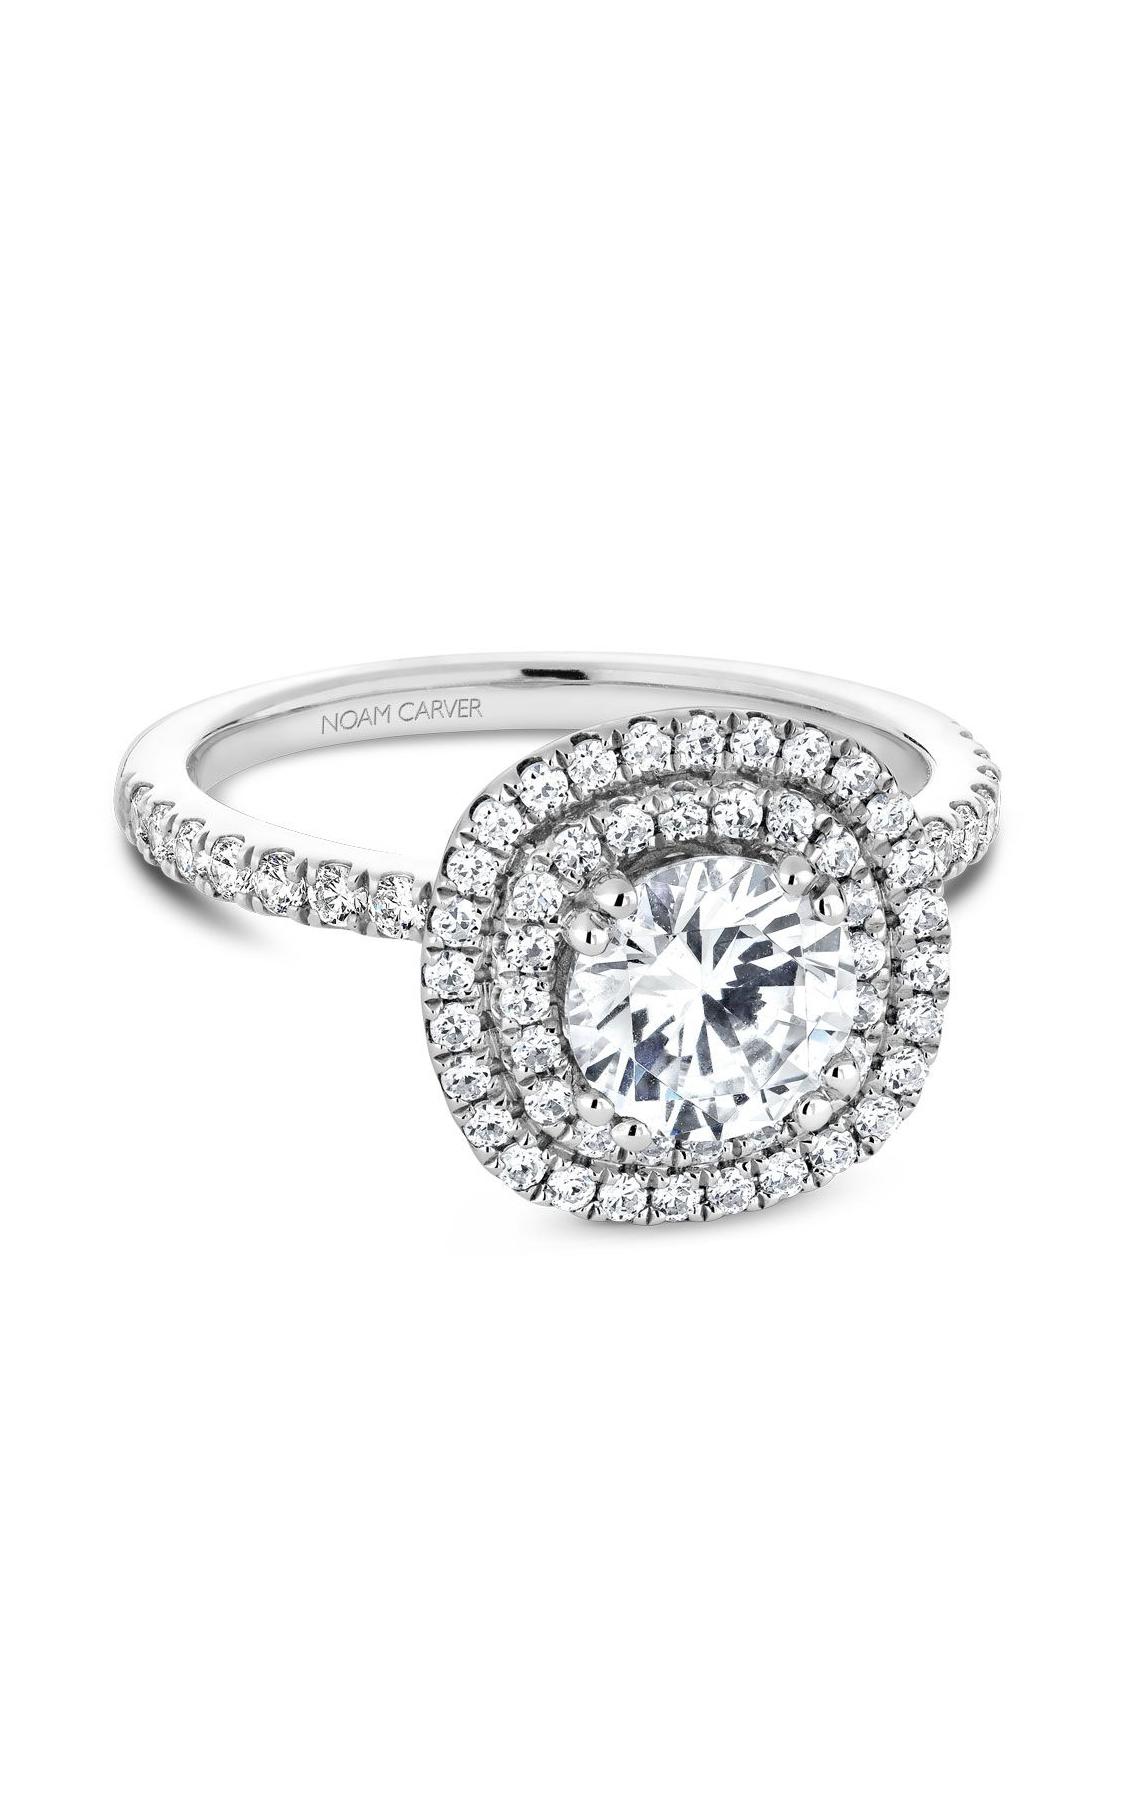 Noam Carver Halo Engagement Ring B142-08WM product image